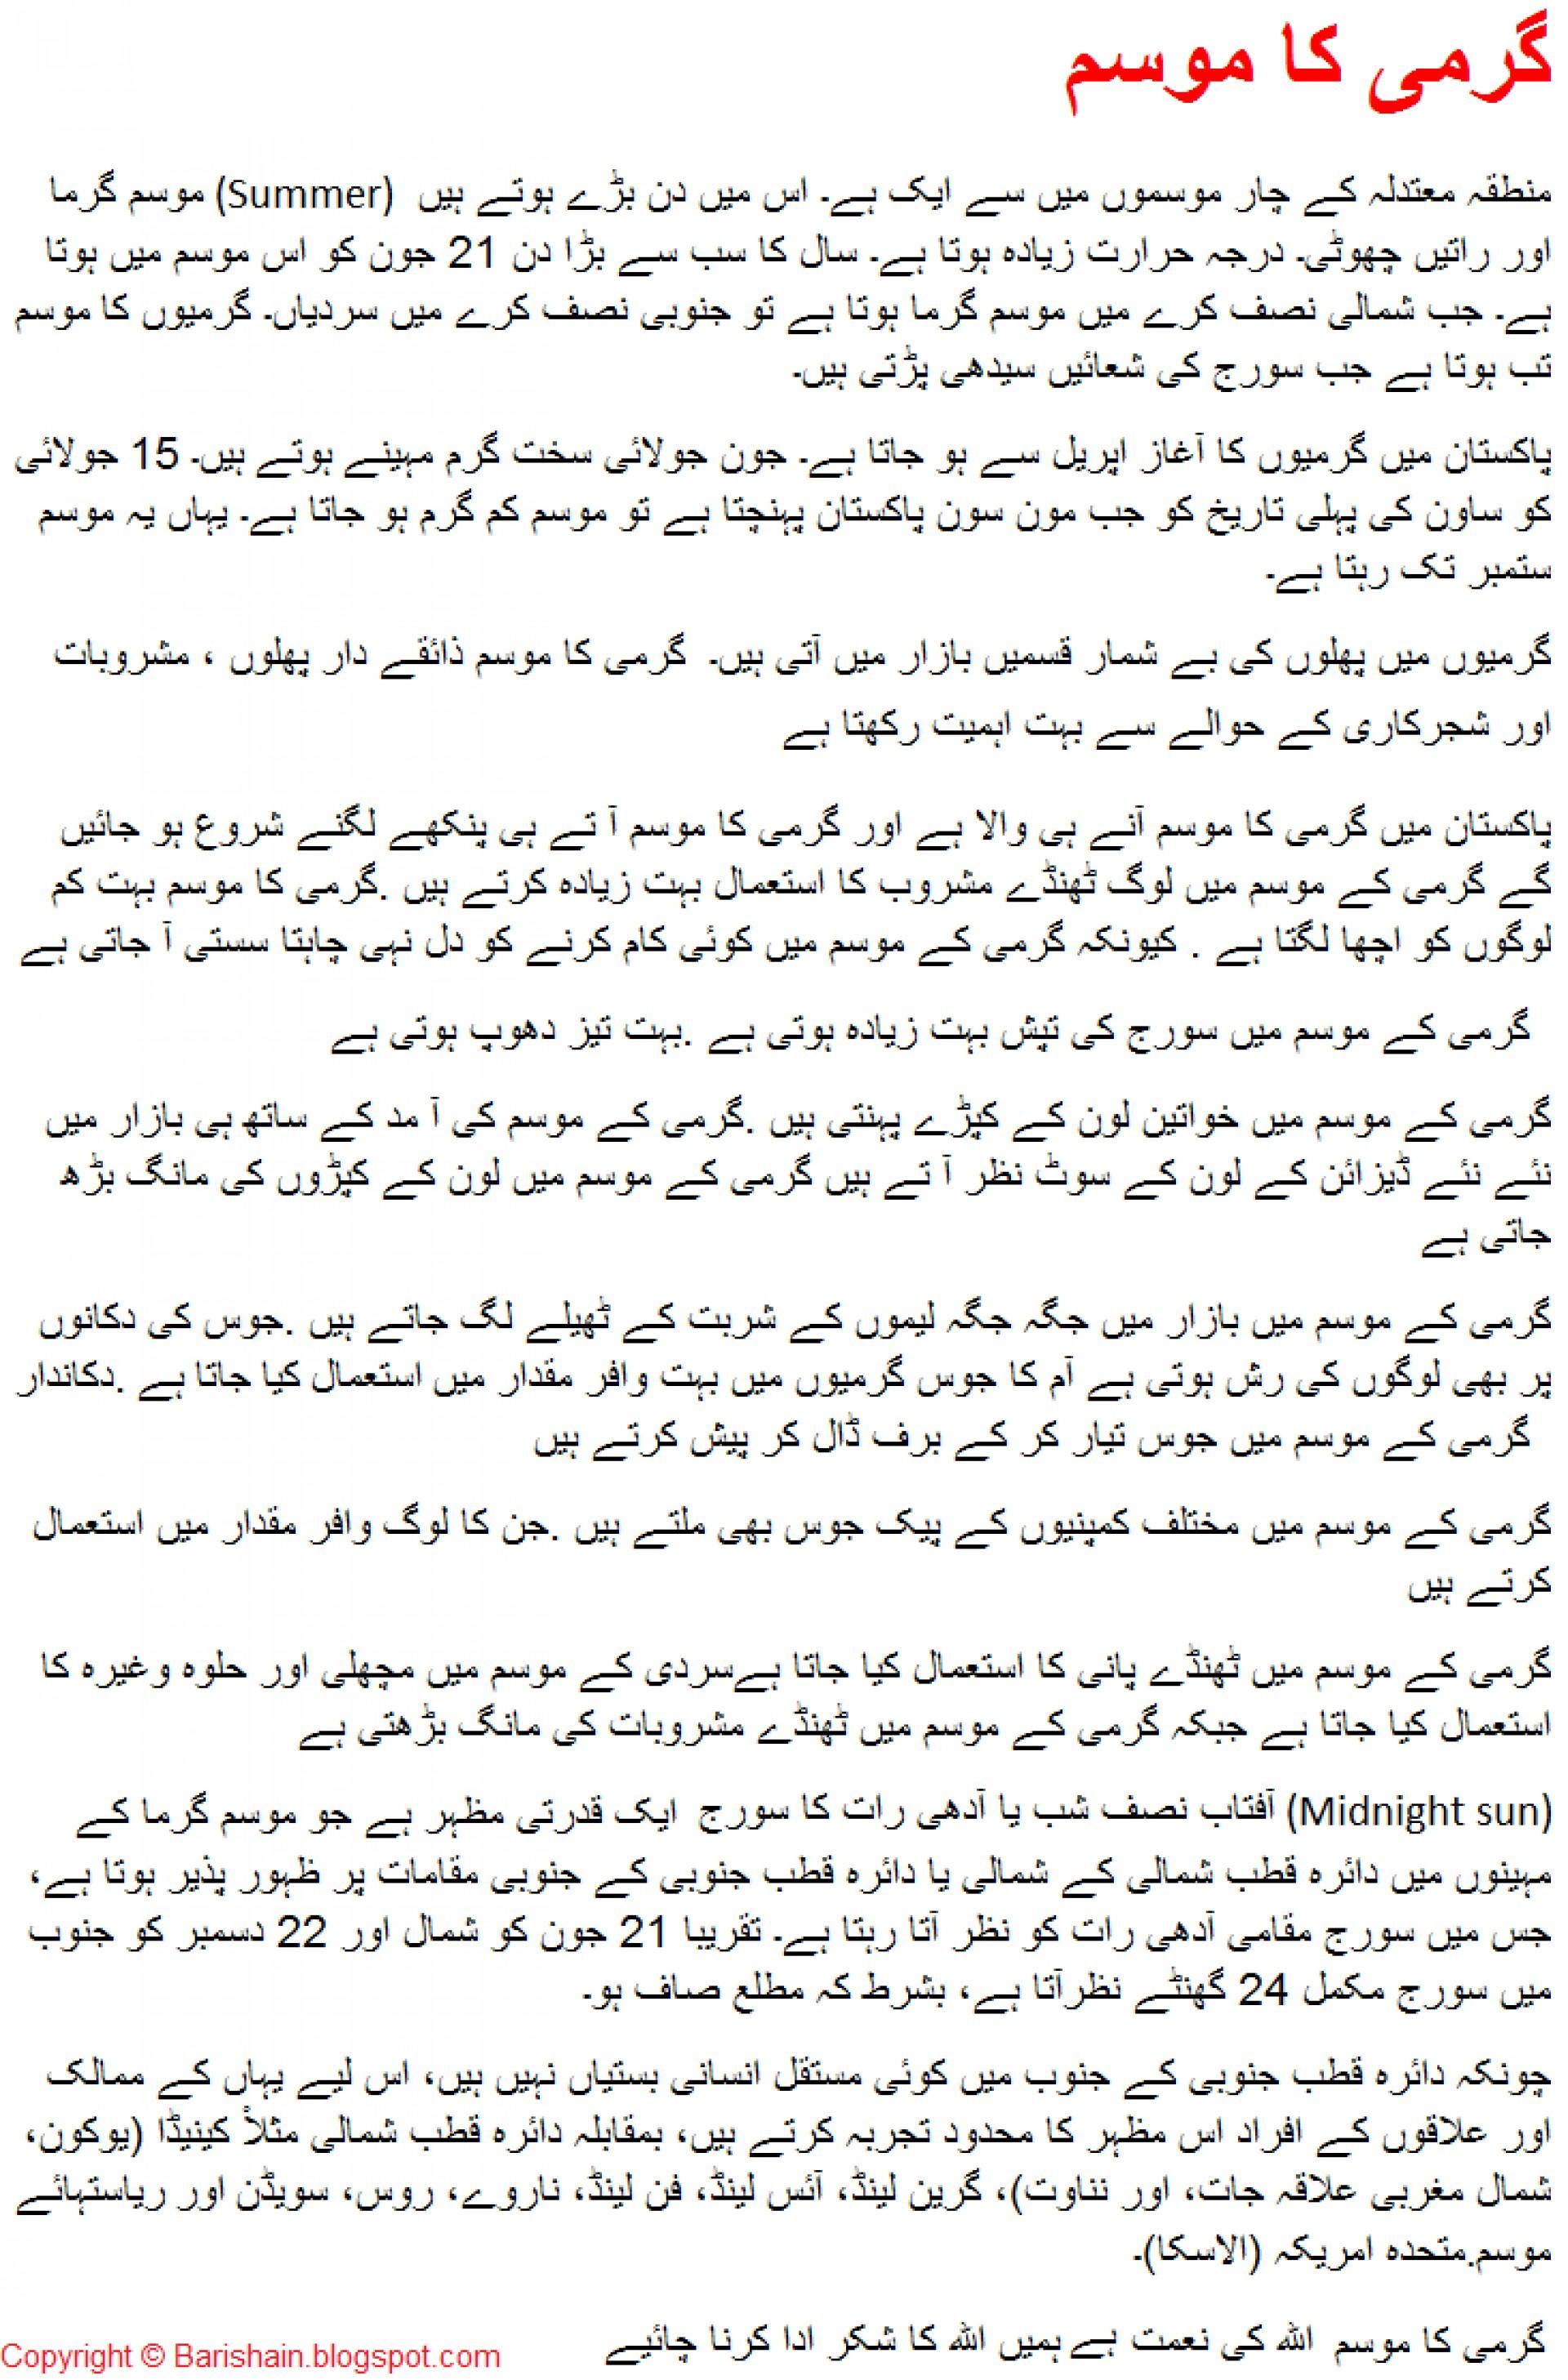 001 Summer Essay Summer2bseason2bin2burdu Unforgettable Vacation In Hindi Class 2 Urdu Conclusion 1920